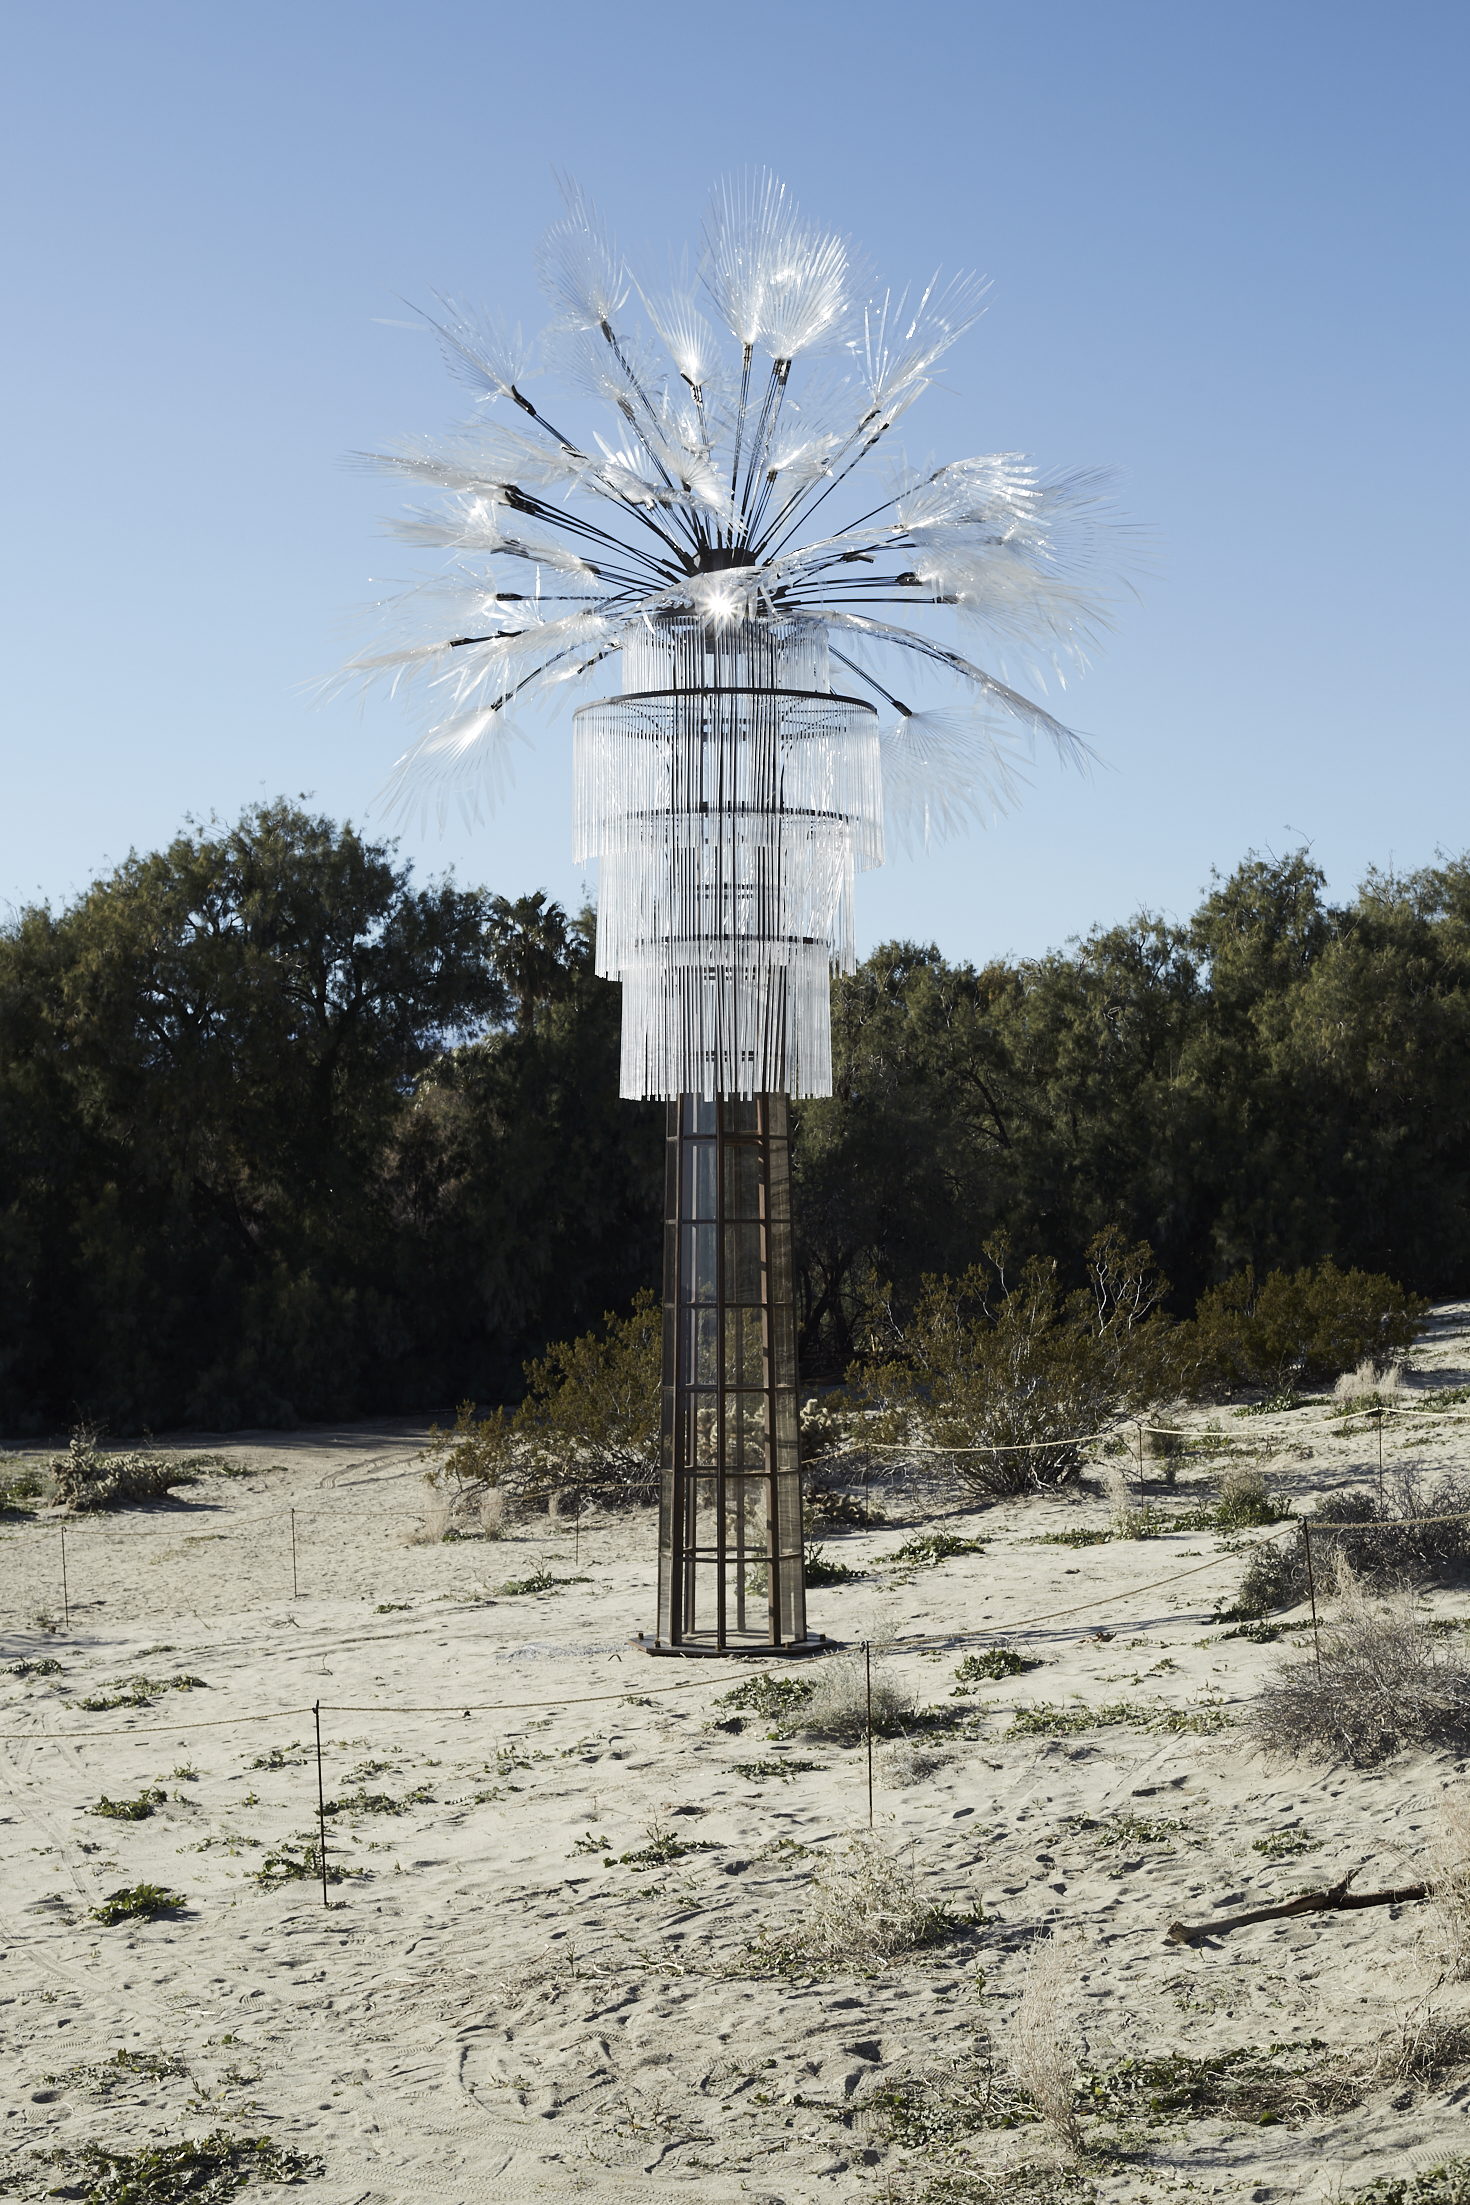 Kathleen Ryan / Ghost Palm, as part of Desert X 2019